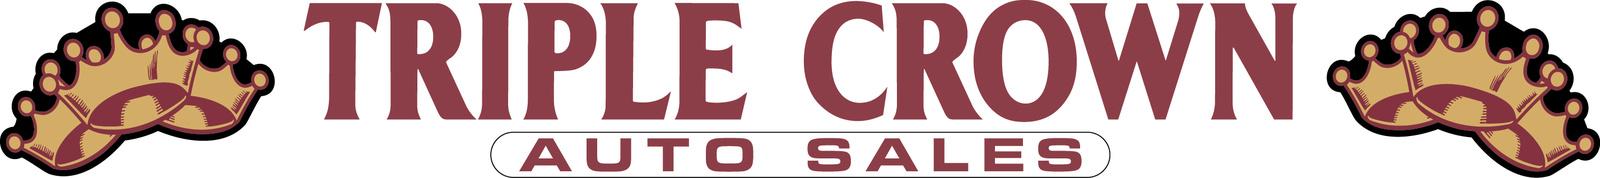 Roseville Chrysler Jeep >> Triple Crown Auto Sales - Roseville, CA: Lee evaluaciones ...